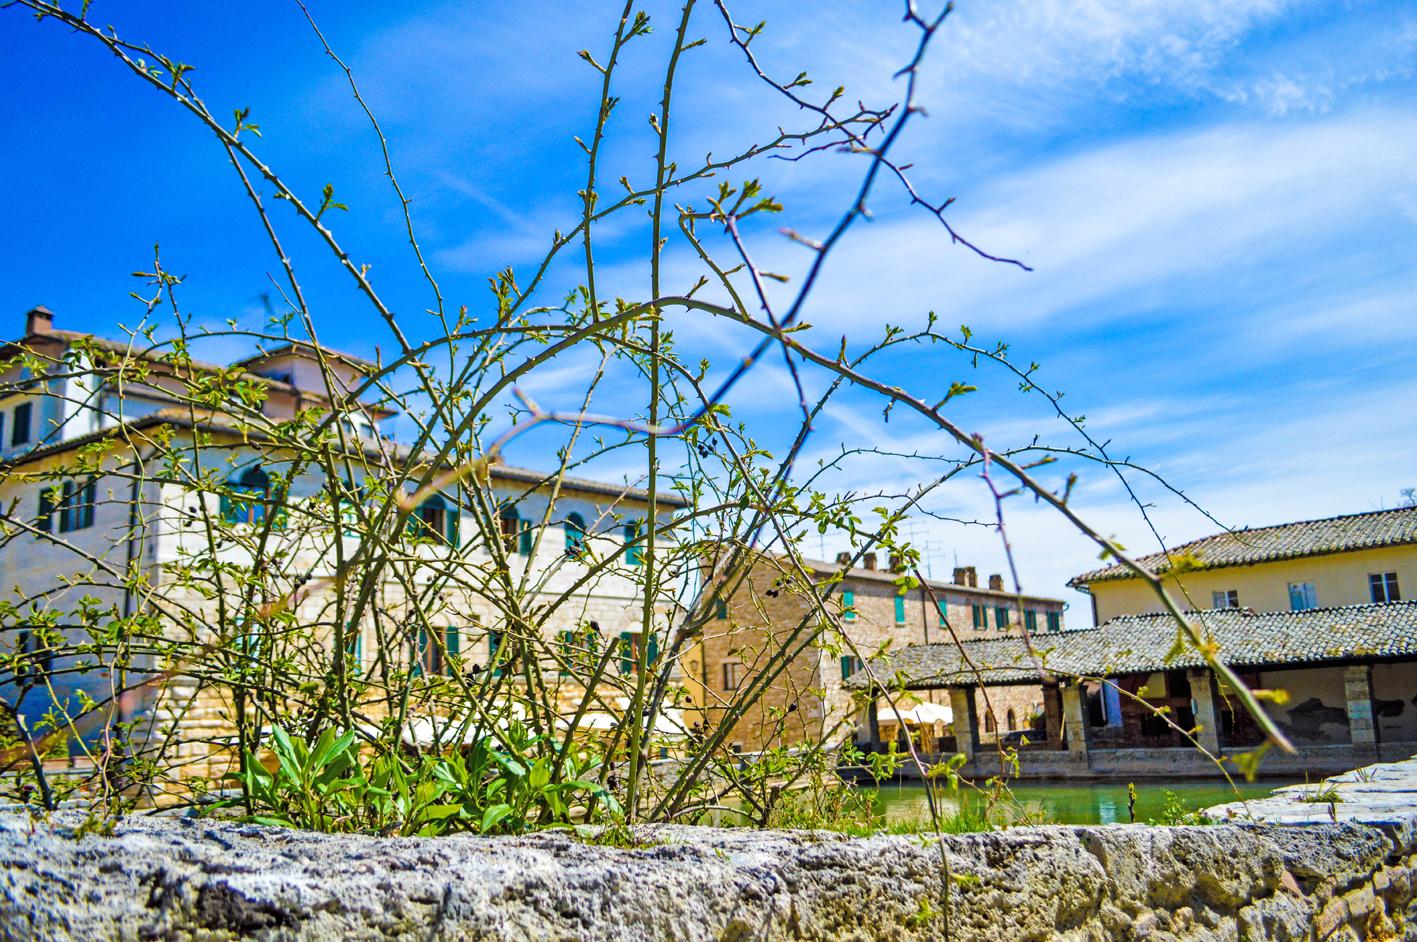 51 #WhereToGo: Bagno Vignoni